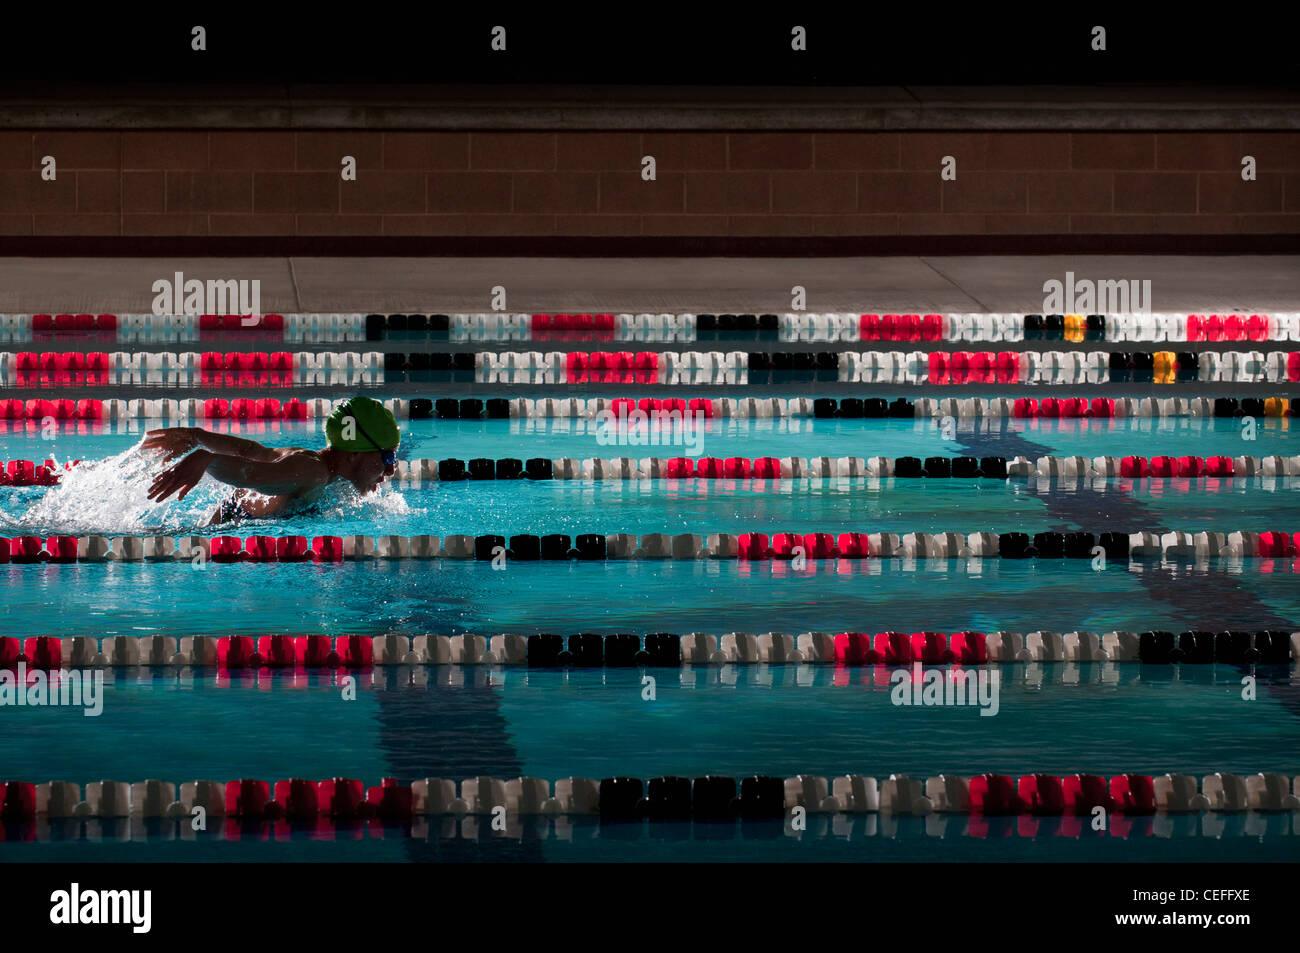 Frau schwimmen Runden im pool Stockbild